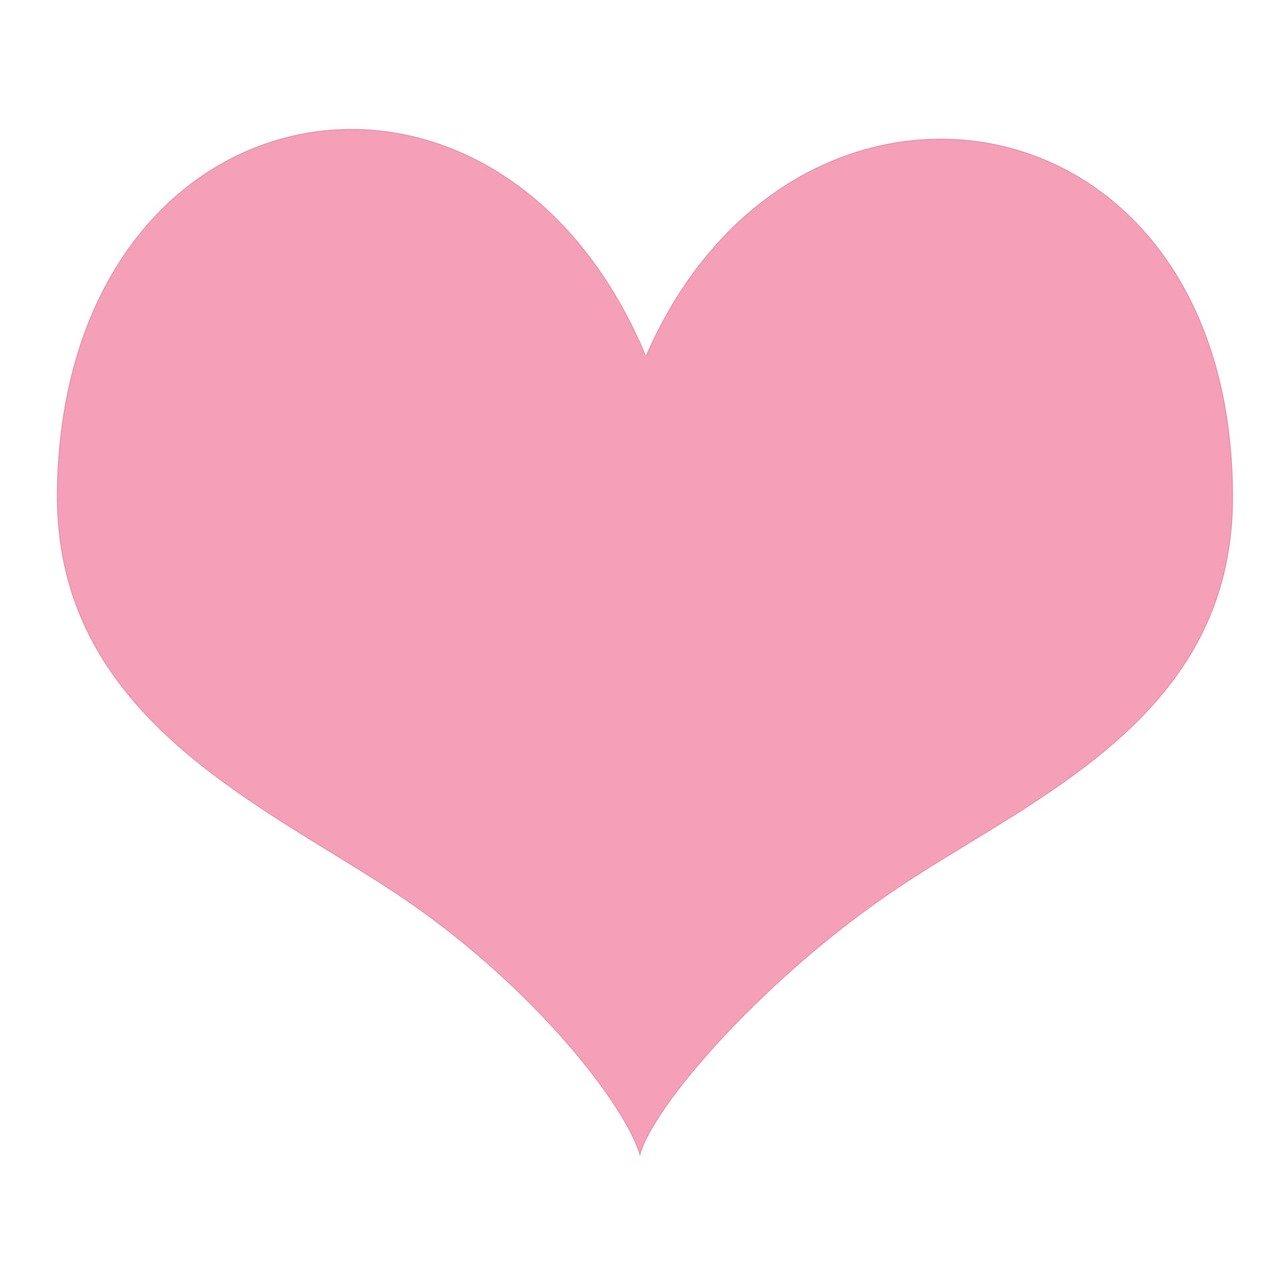 heart-938313_1280